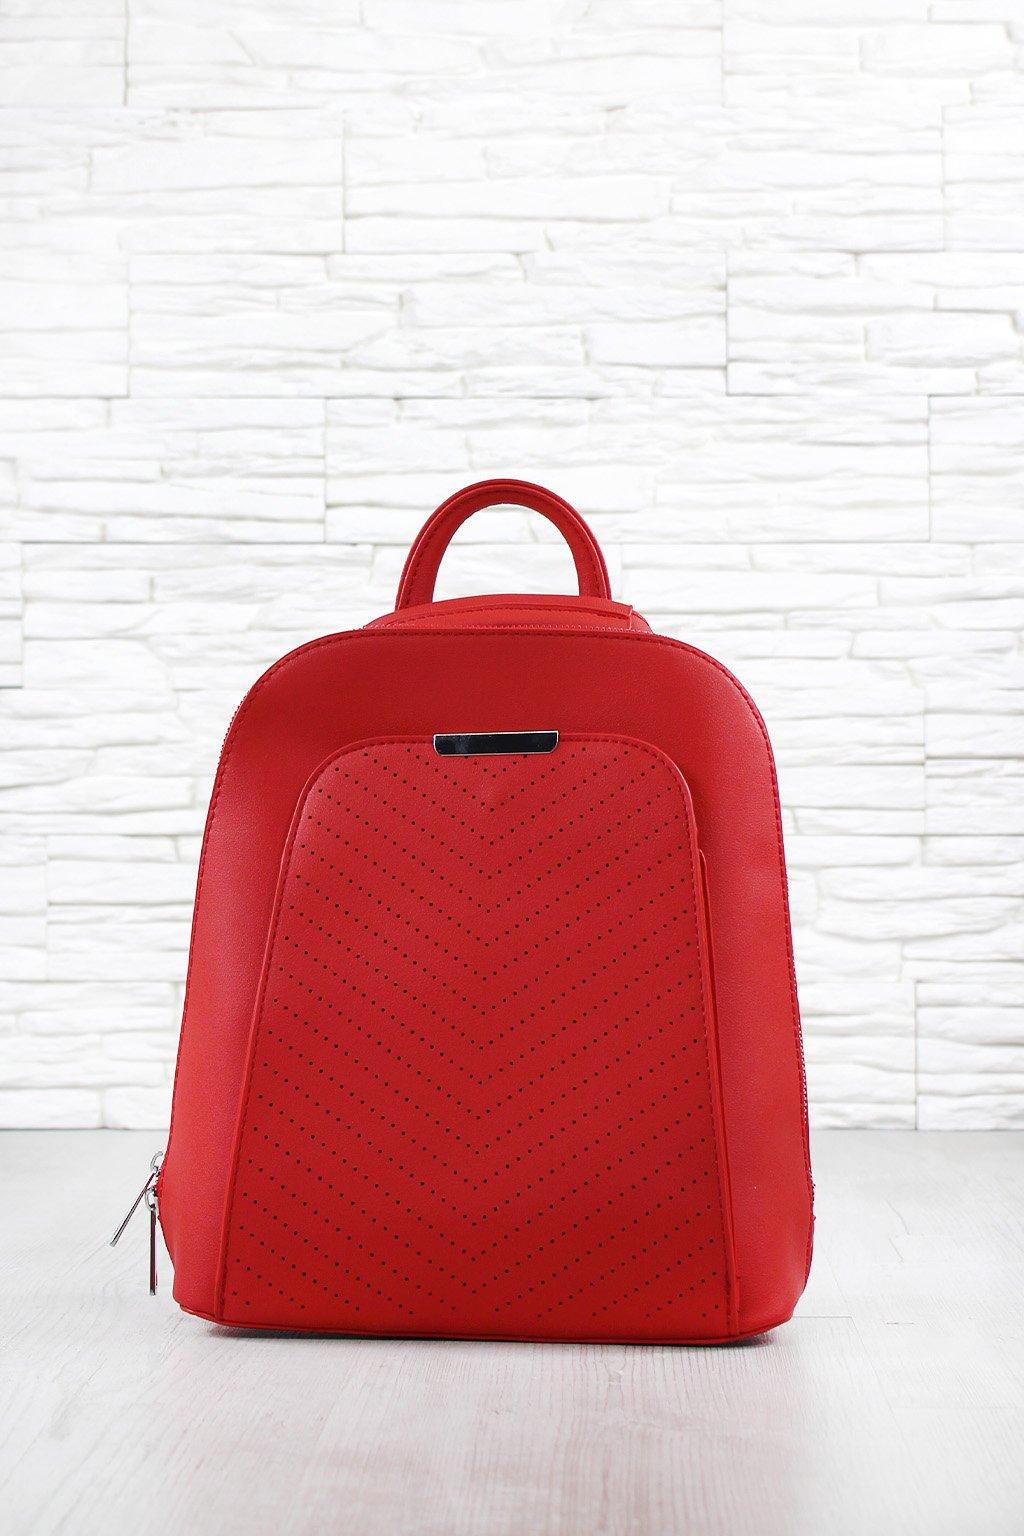 Batoh červený 5362 BB r (1)